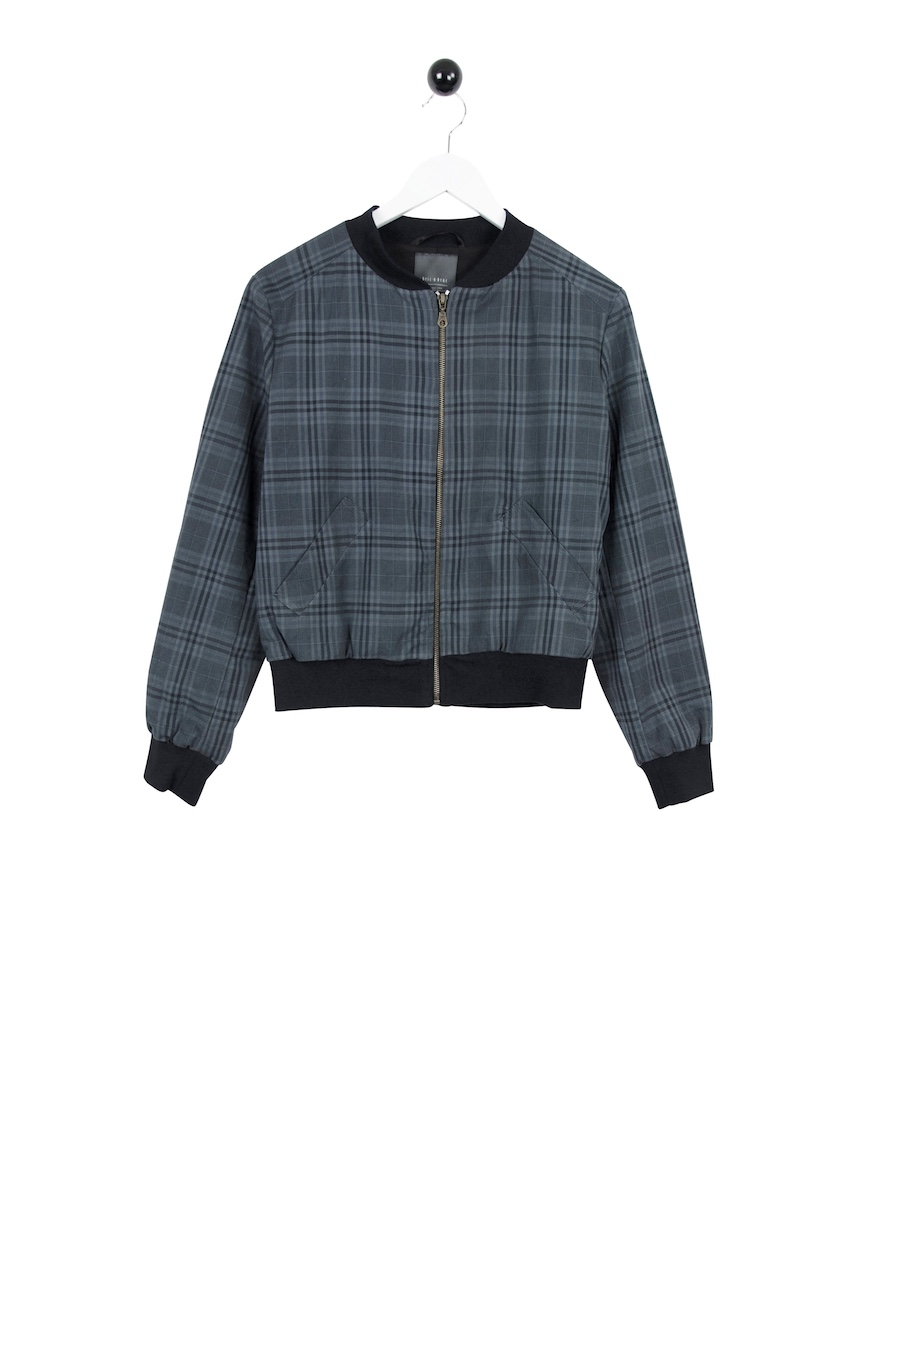 Tricase Jacket